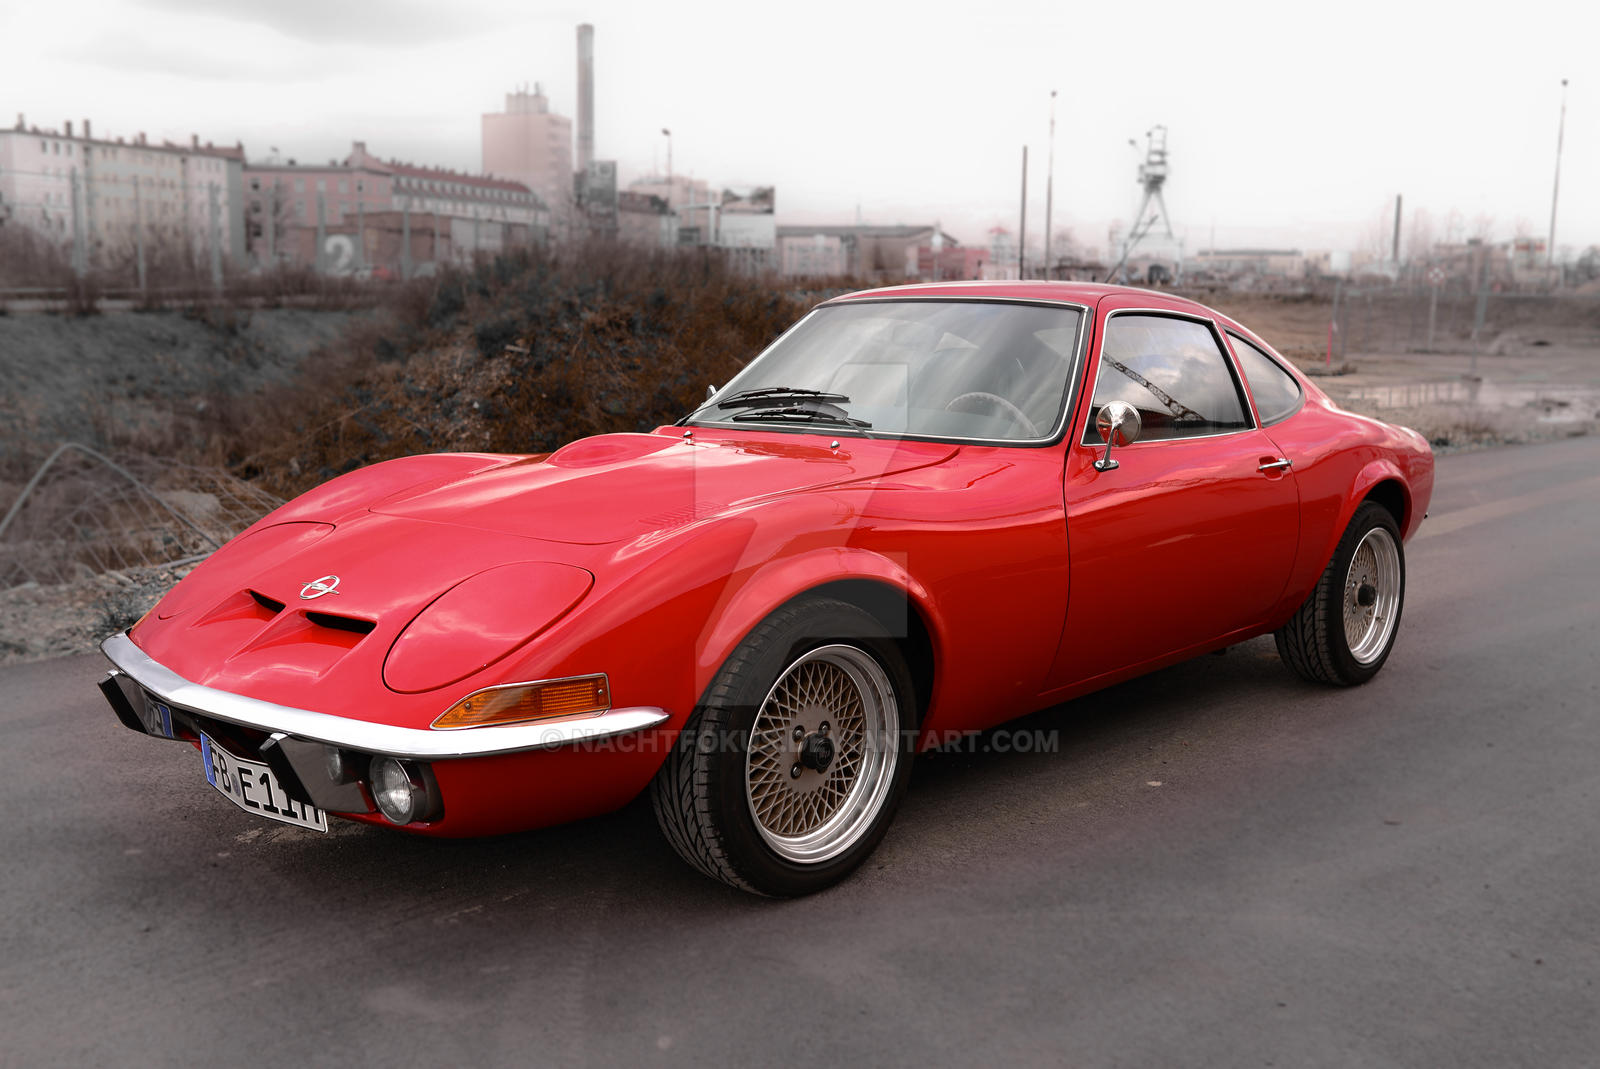 Opel / Vauxhall GT classic